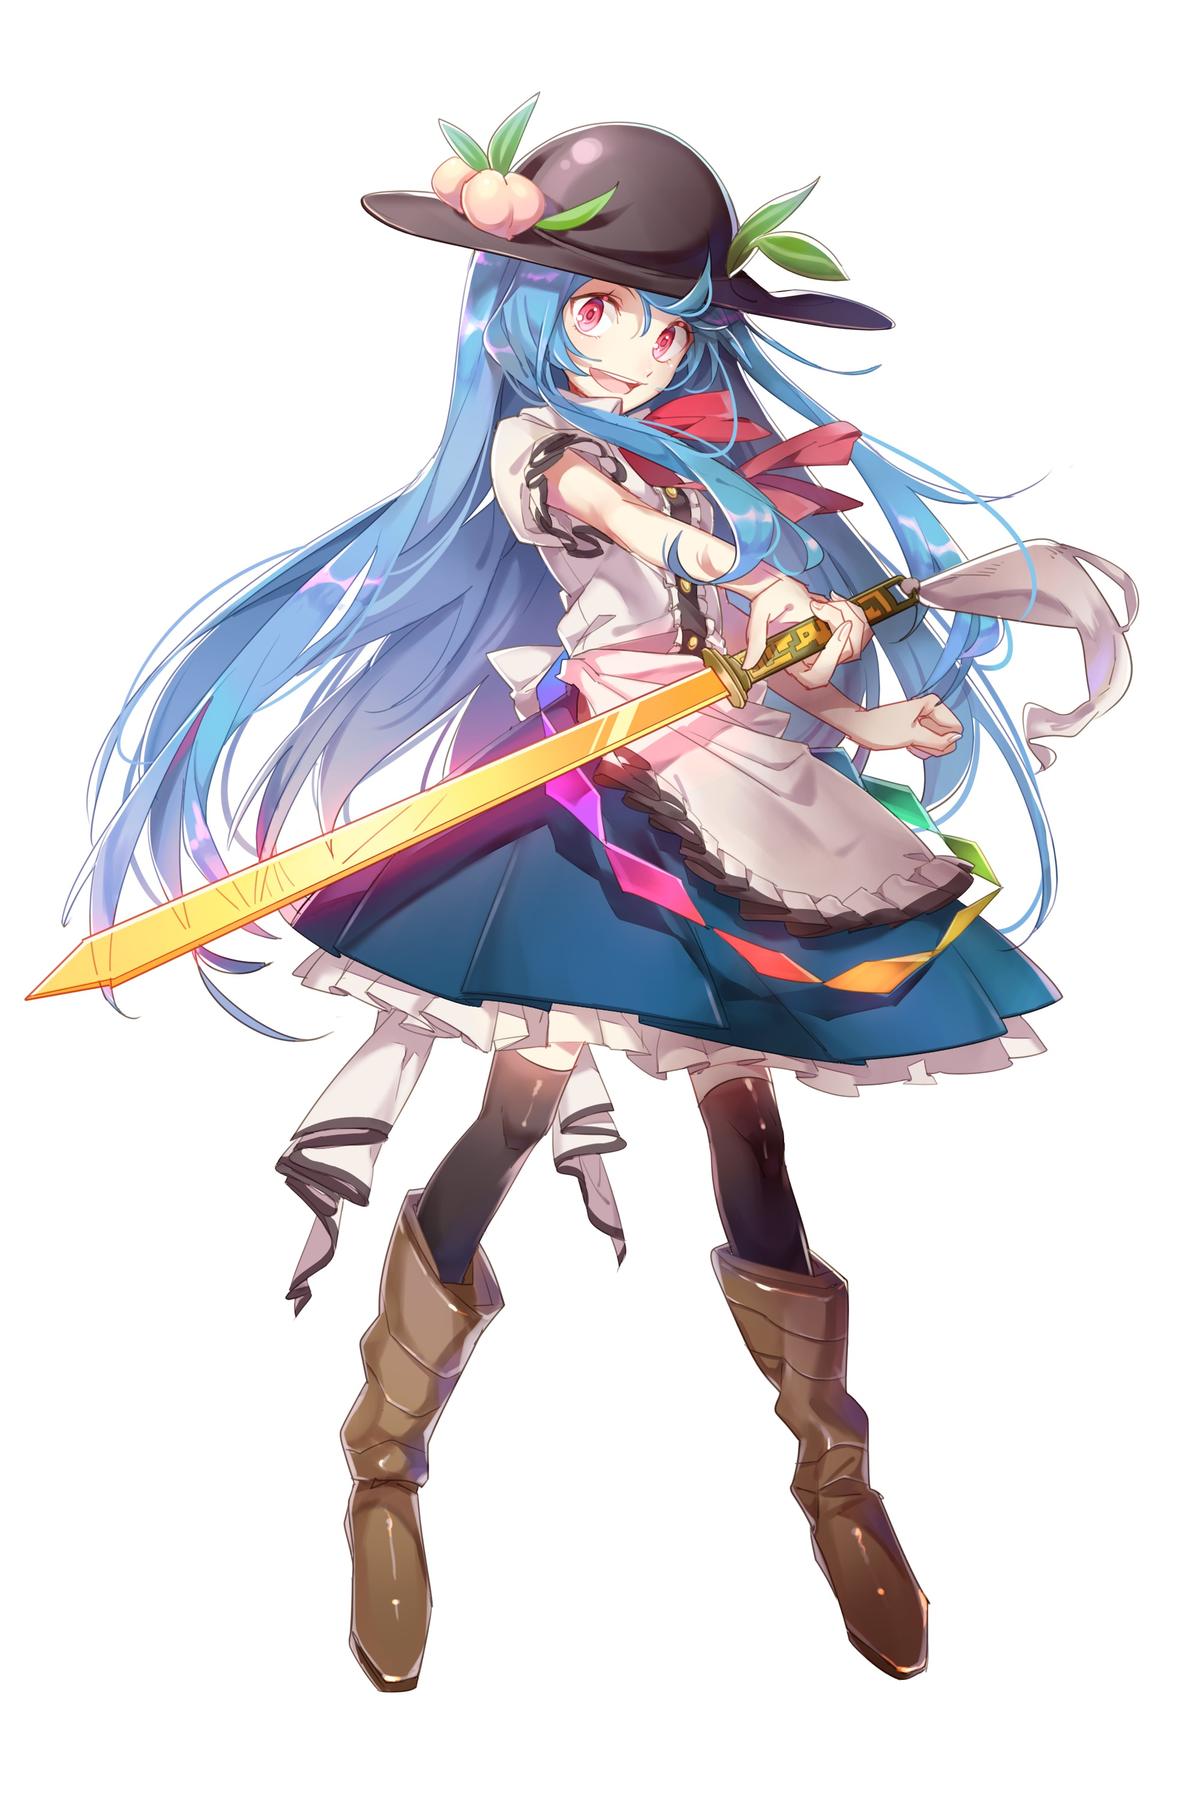 tags fanart touhou hinanawi tenshi aibivy character art character design inspiration awesome anime